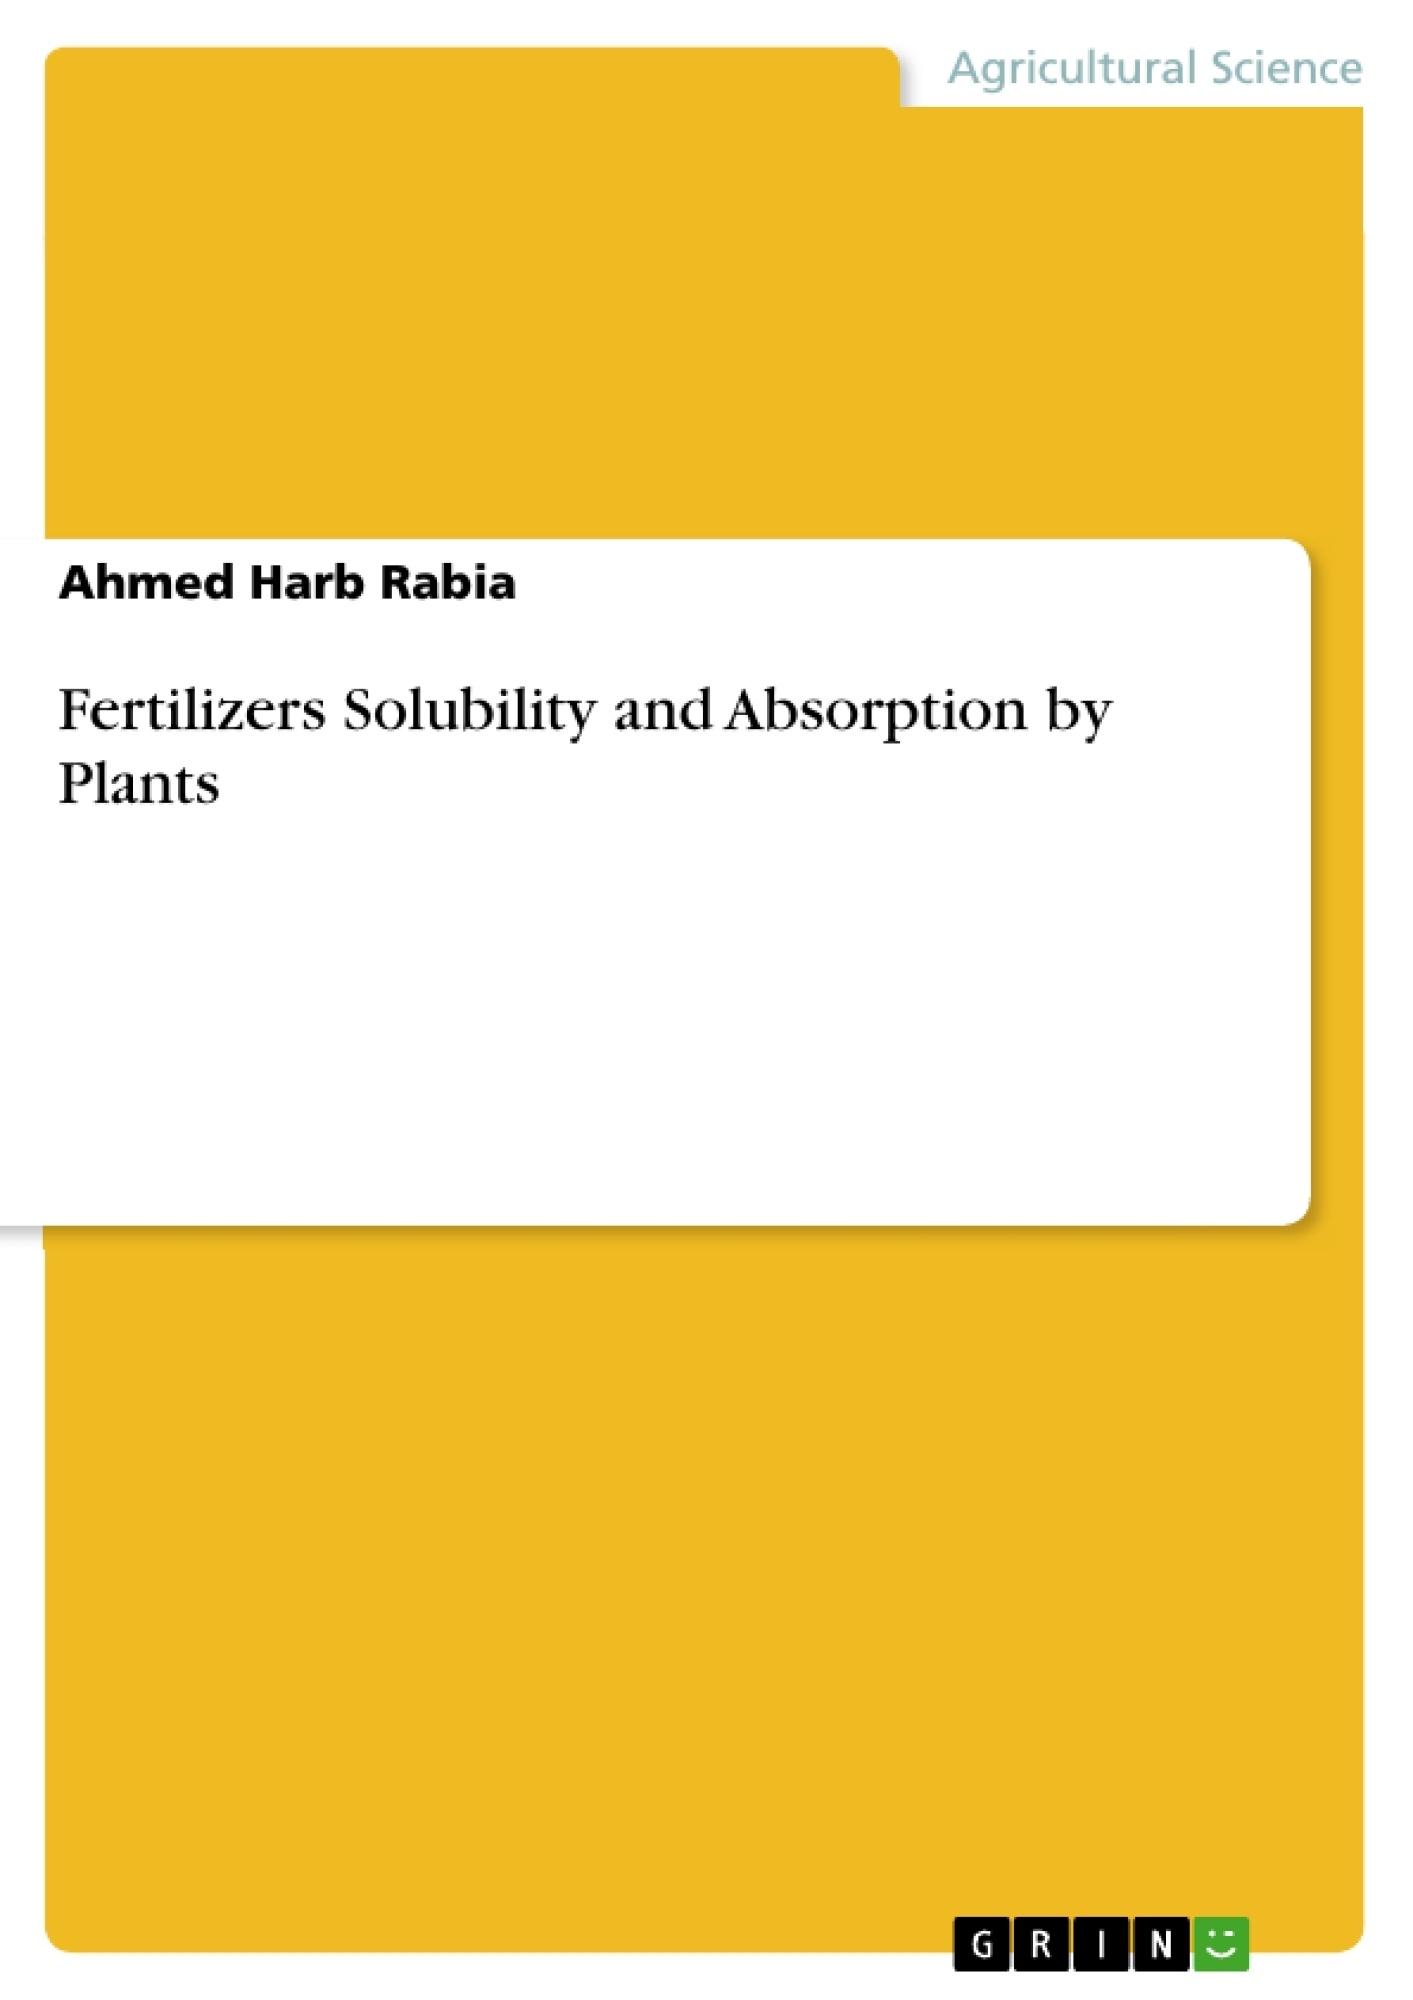 Thesis on plant growth promoting rhizobacteria